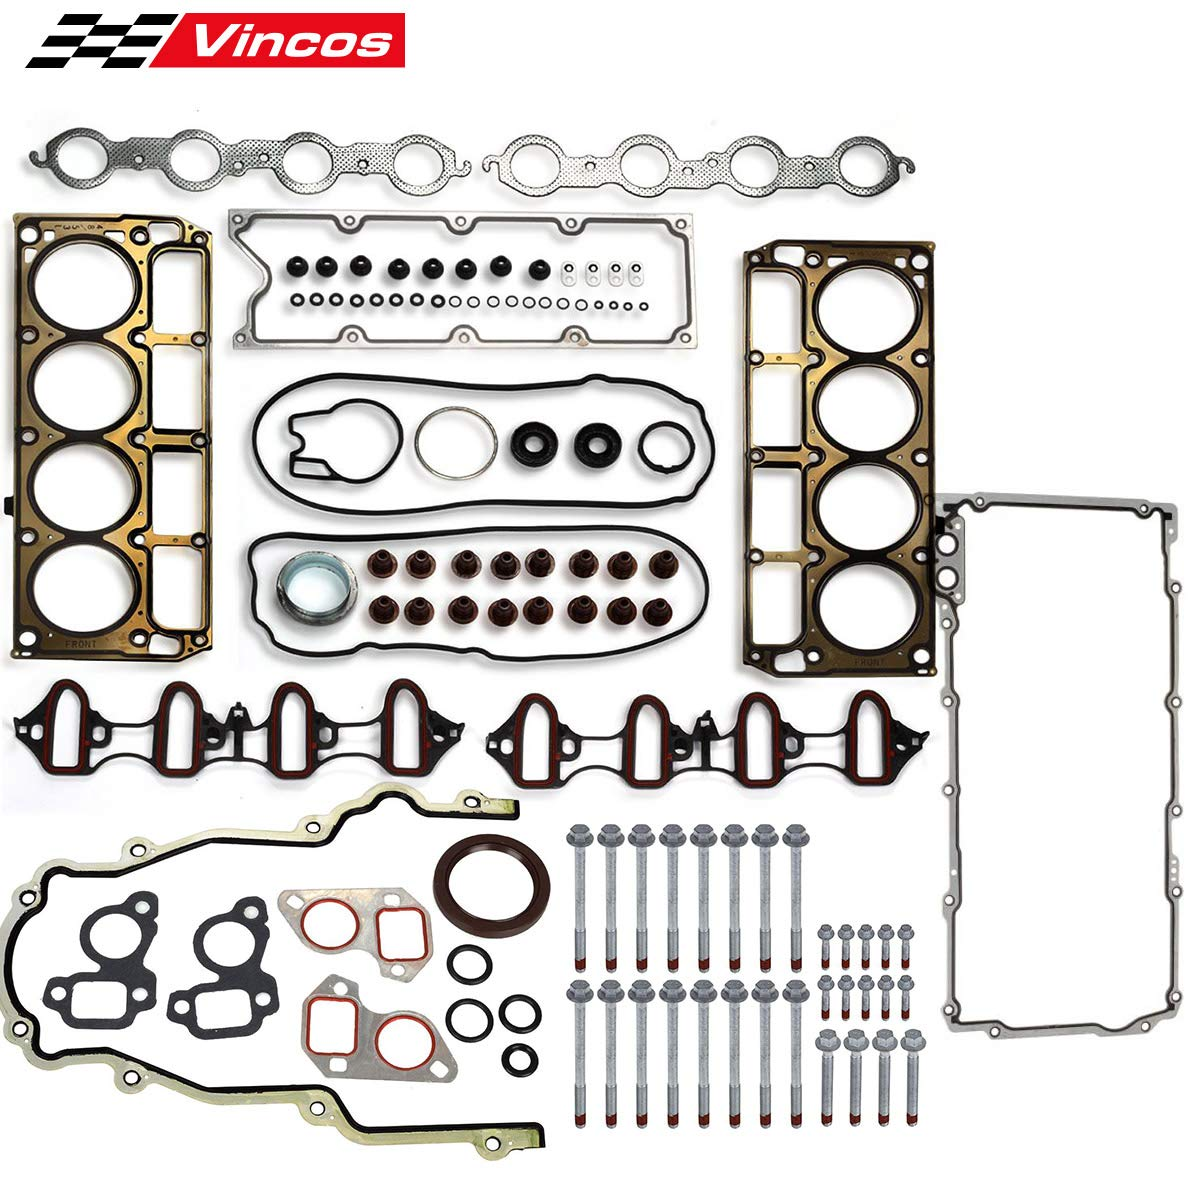 Vincos MLS Full Cylinder Engine Gasket Set w/Head bolts Compatible with chevy silverado tahoe gmc sierra 1500 yukon envoy buick trailblazer 4.8L 5.3L V8